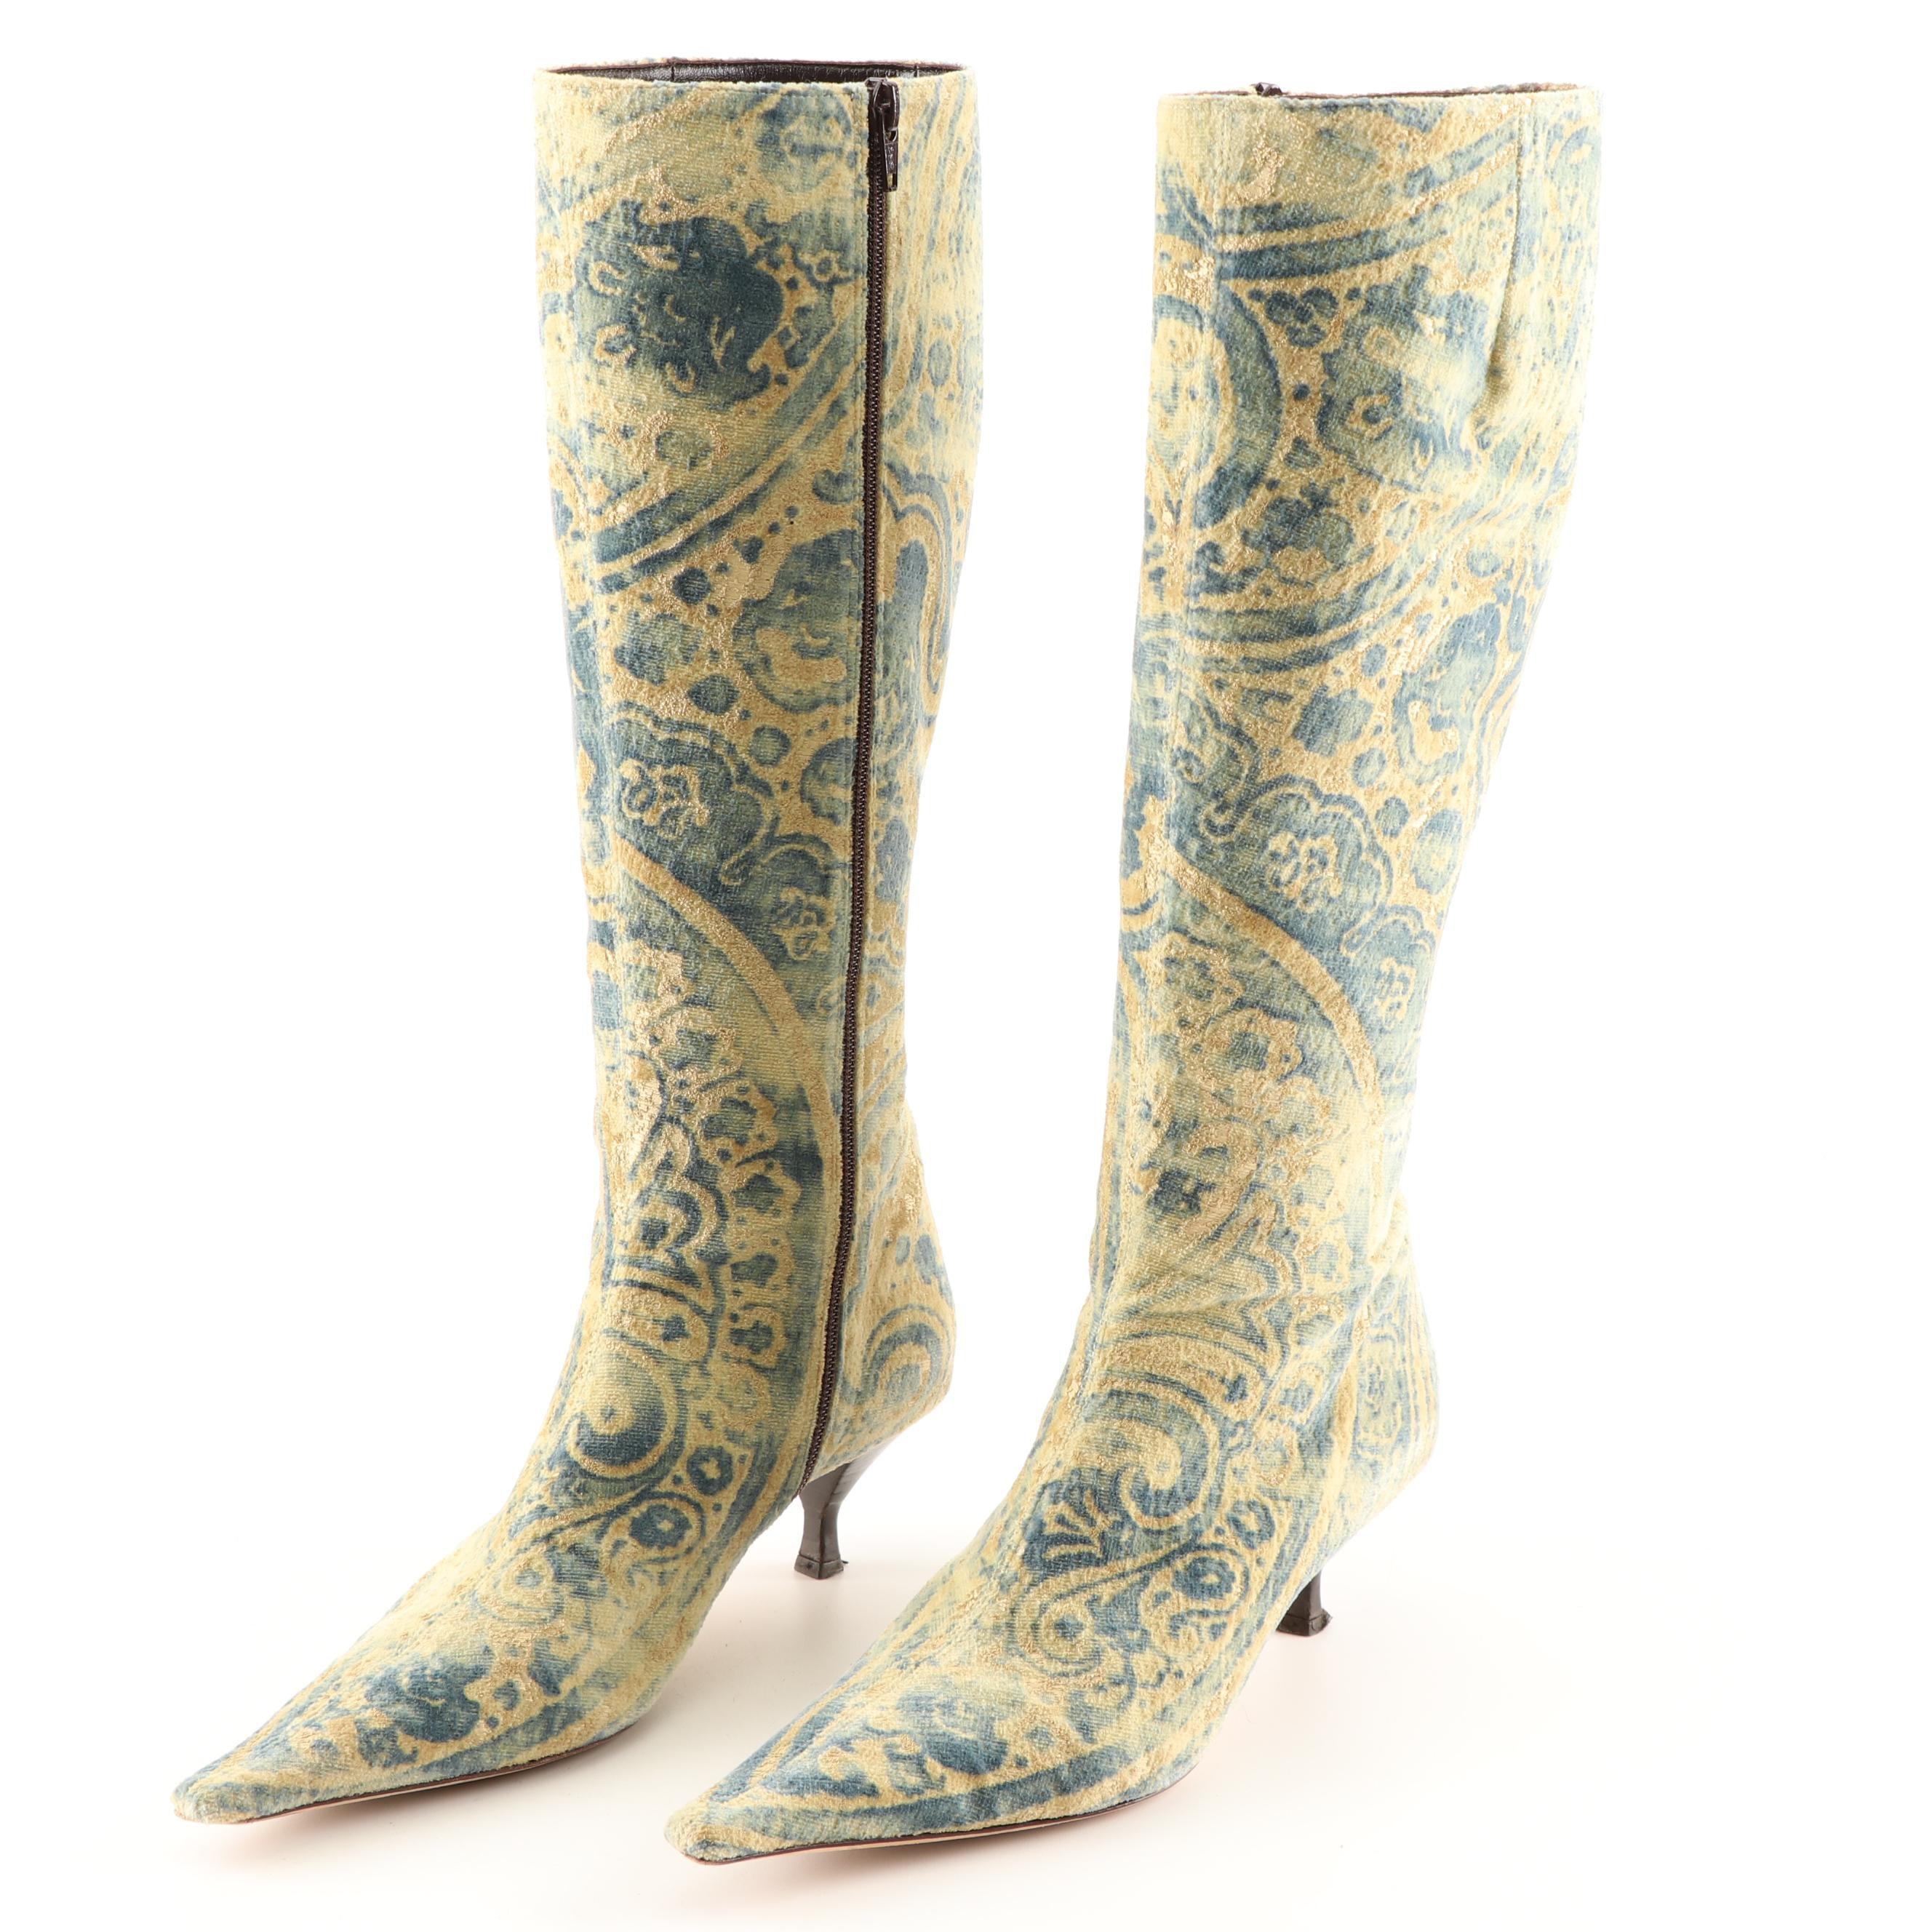 Bettye Mueller Printed Velveteen Boots